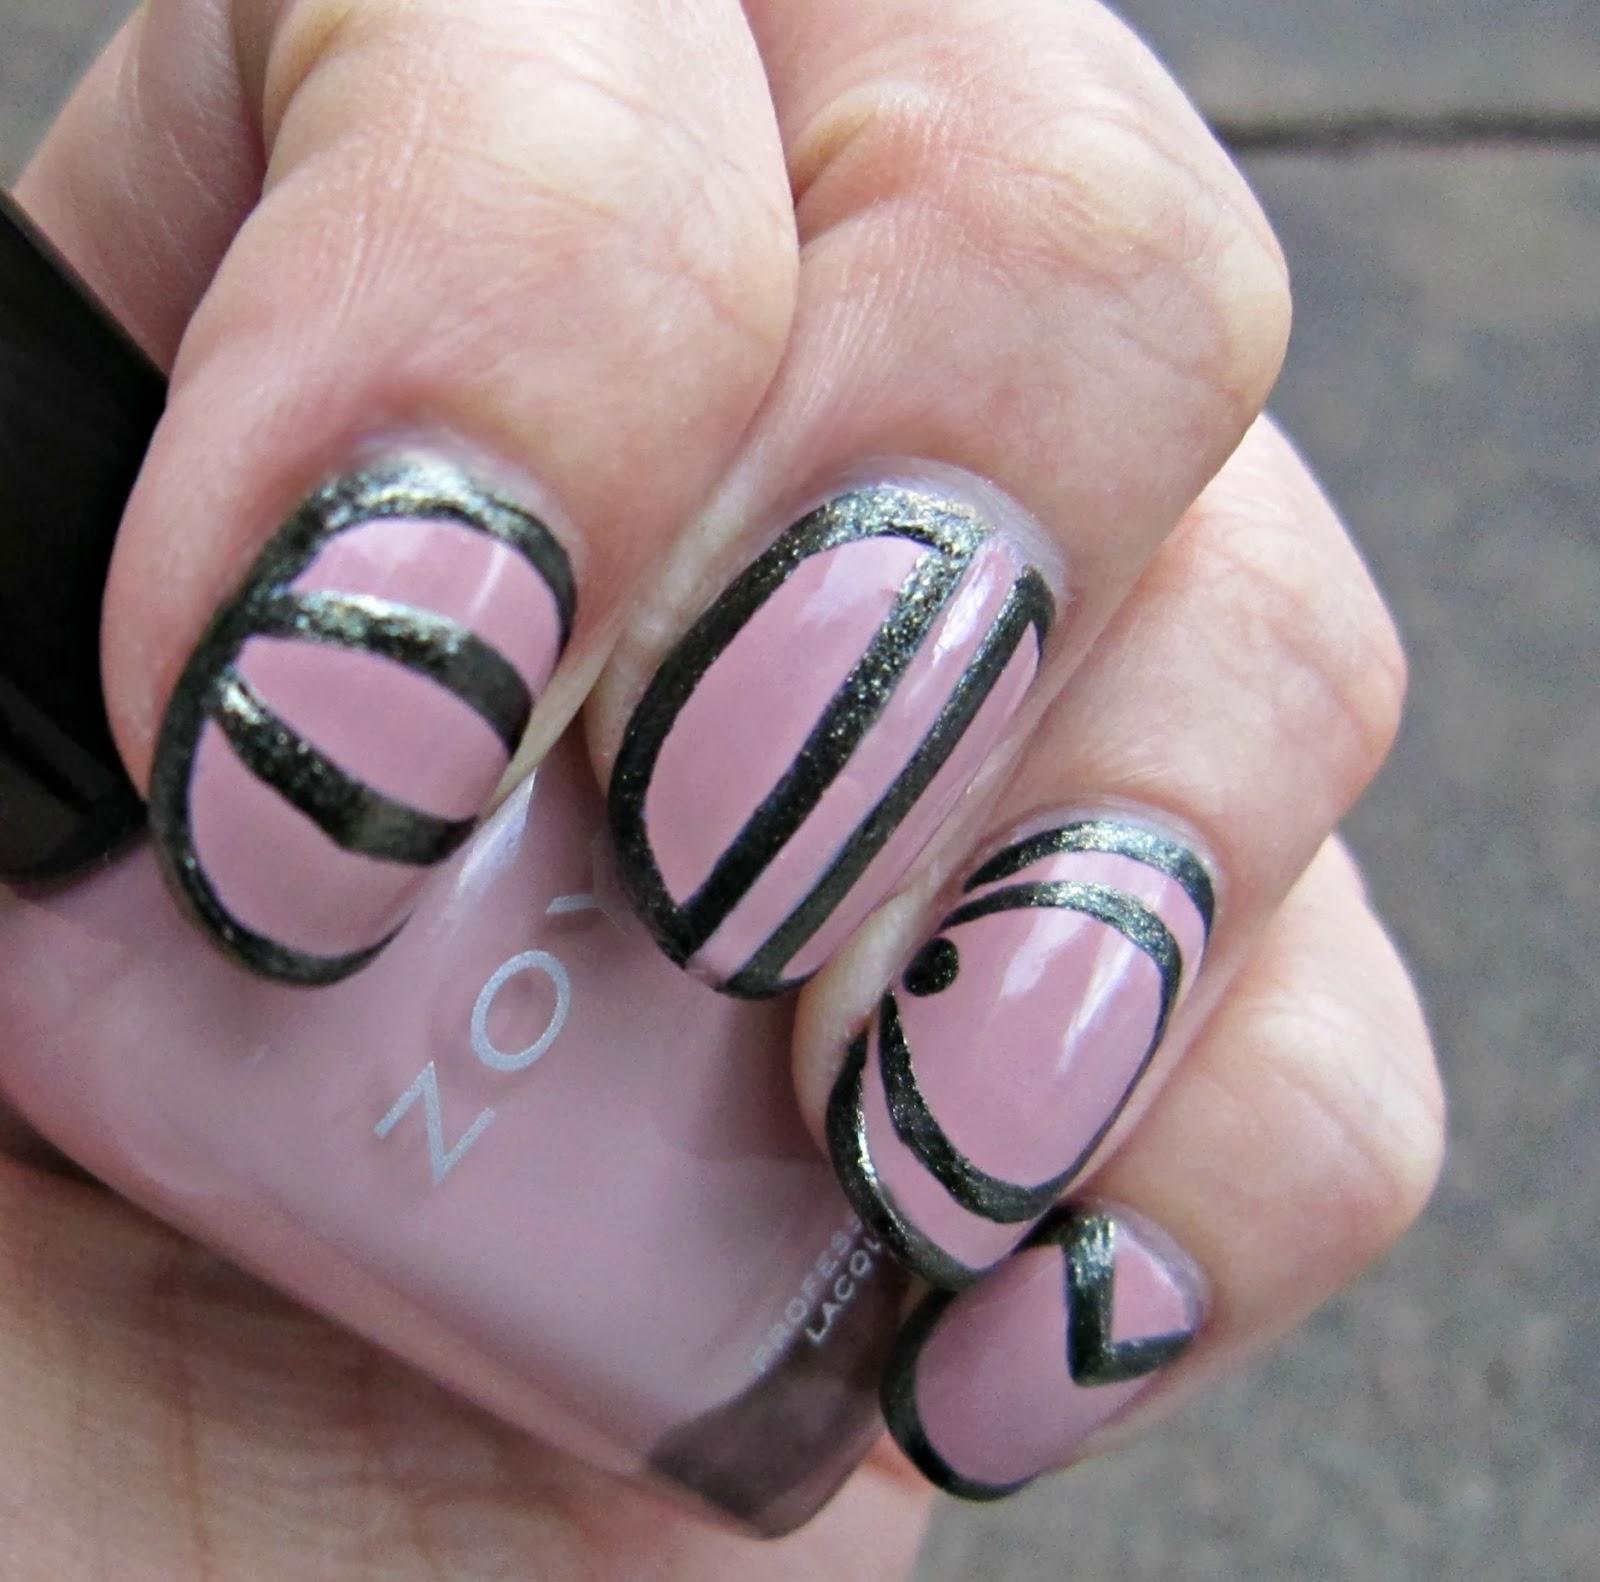 Concrete And Nail Polish Striped Nail Art: Concrete And Nail Polish: Nail Art Inspired By Freestyle